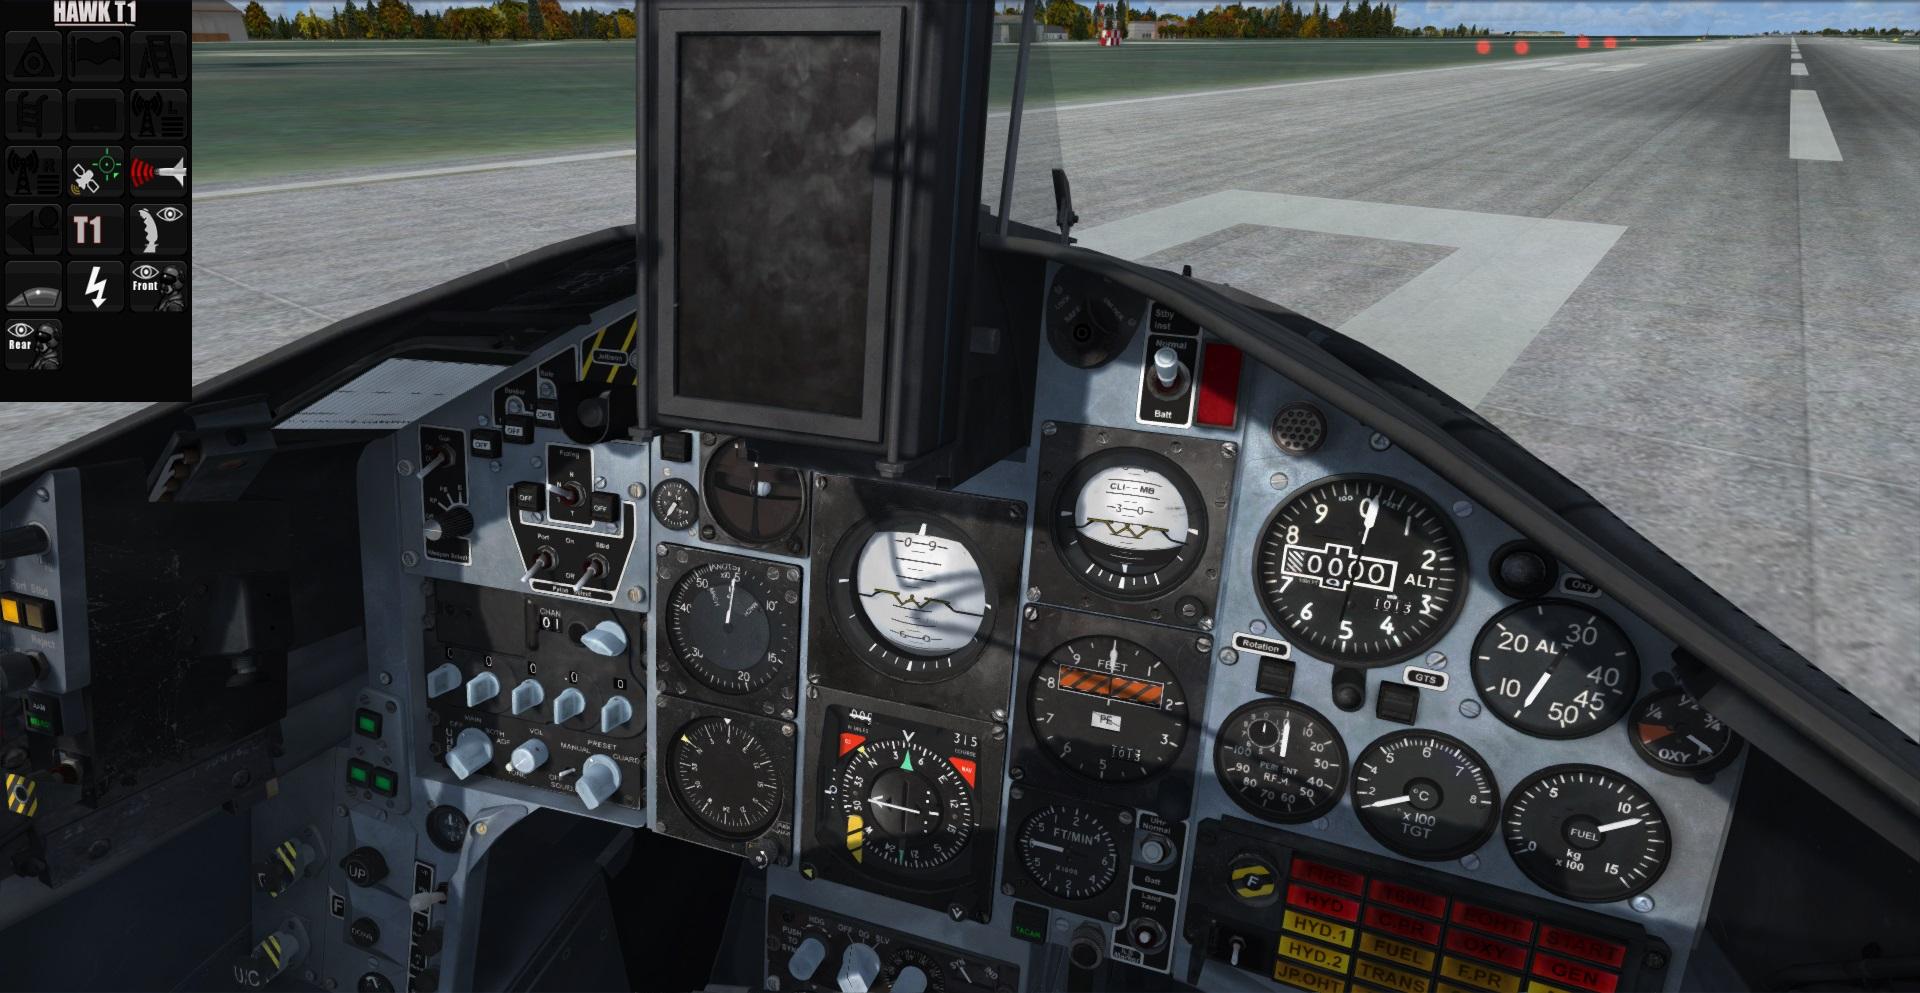 HawkT1A_RTM_34.jpg